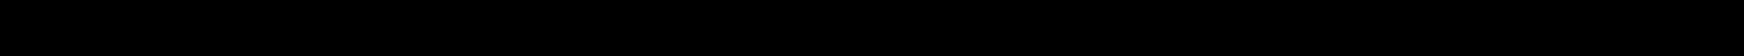 cfarmadillostd-light-webfont.ttf